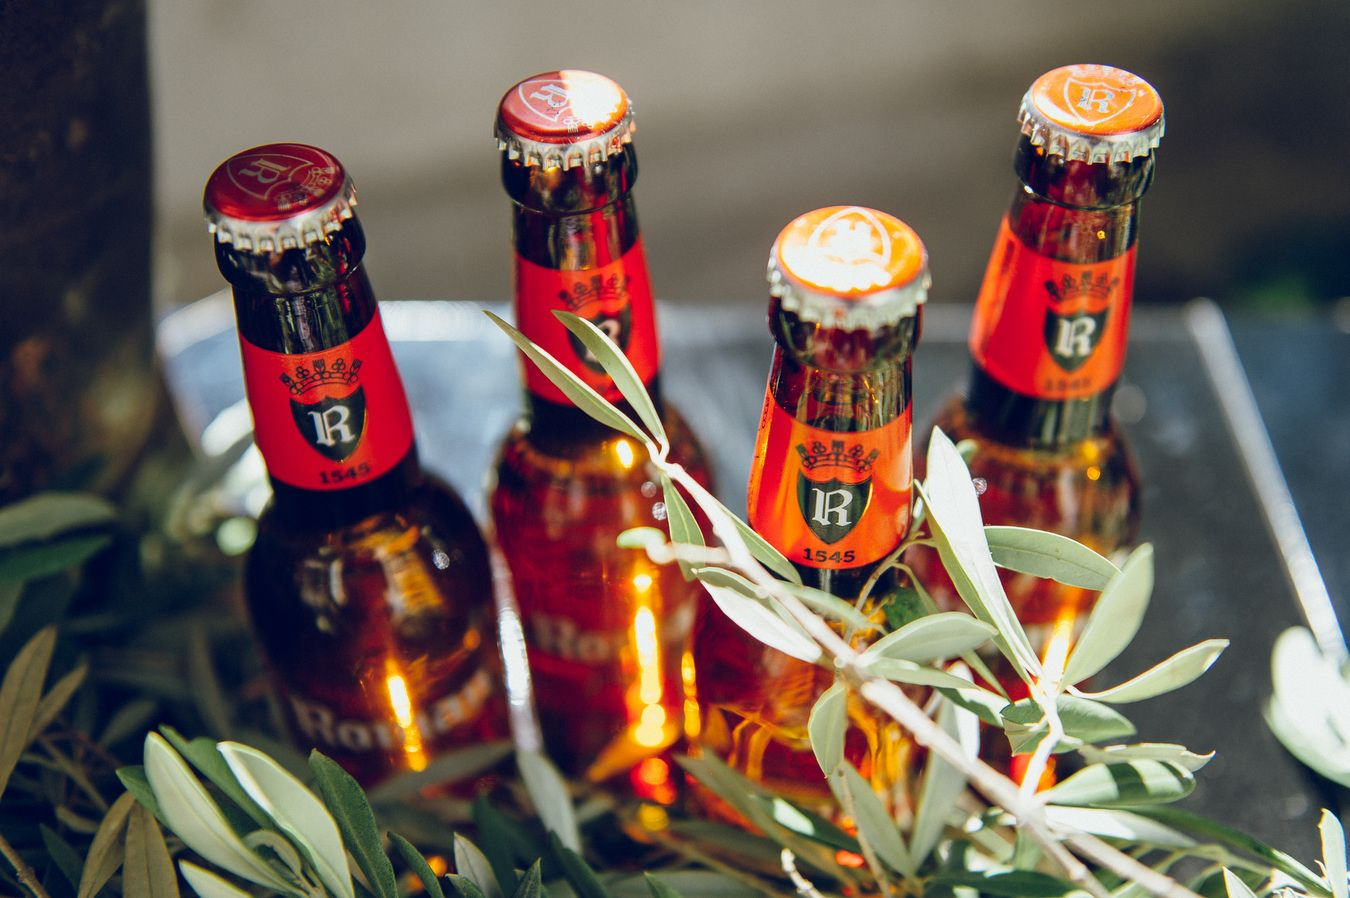 calista-one-lista-de-bodas-online-blog-de-bodas-calista-one-summer-party-2016-roman-cervezas-4